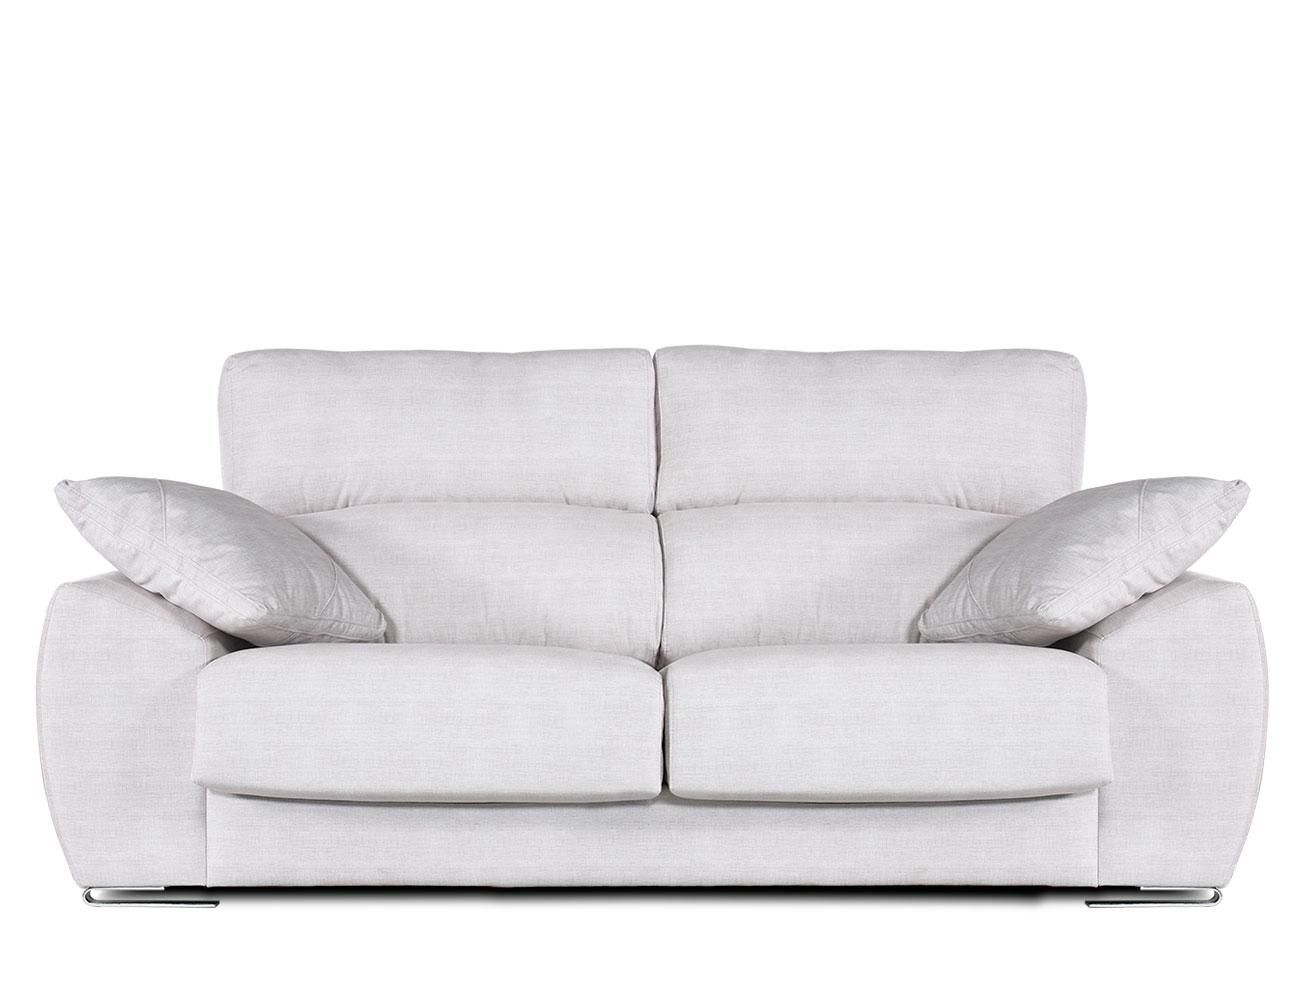 Sofa moderno 3plazas2